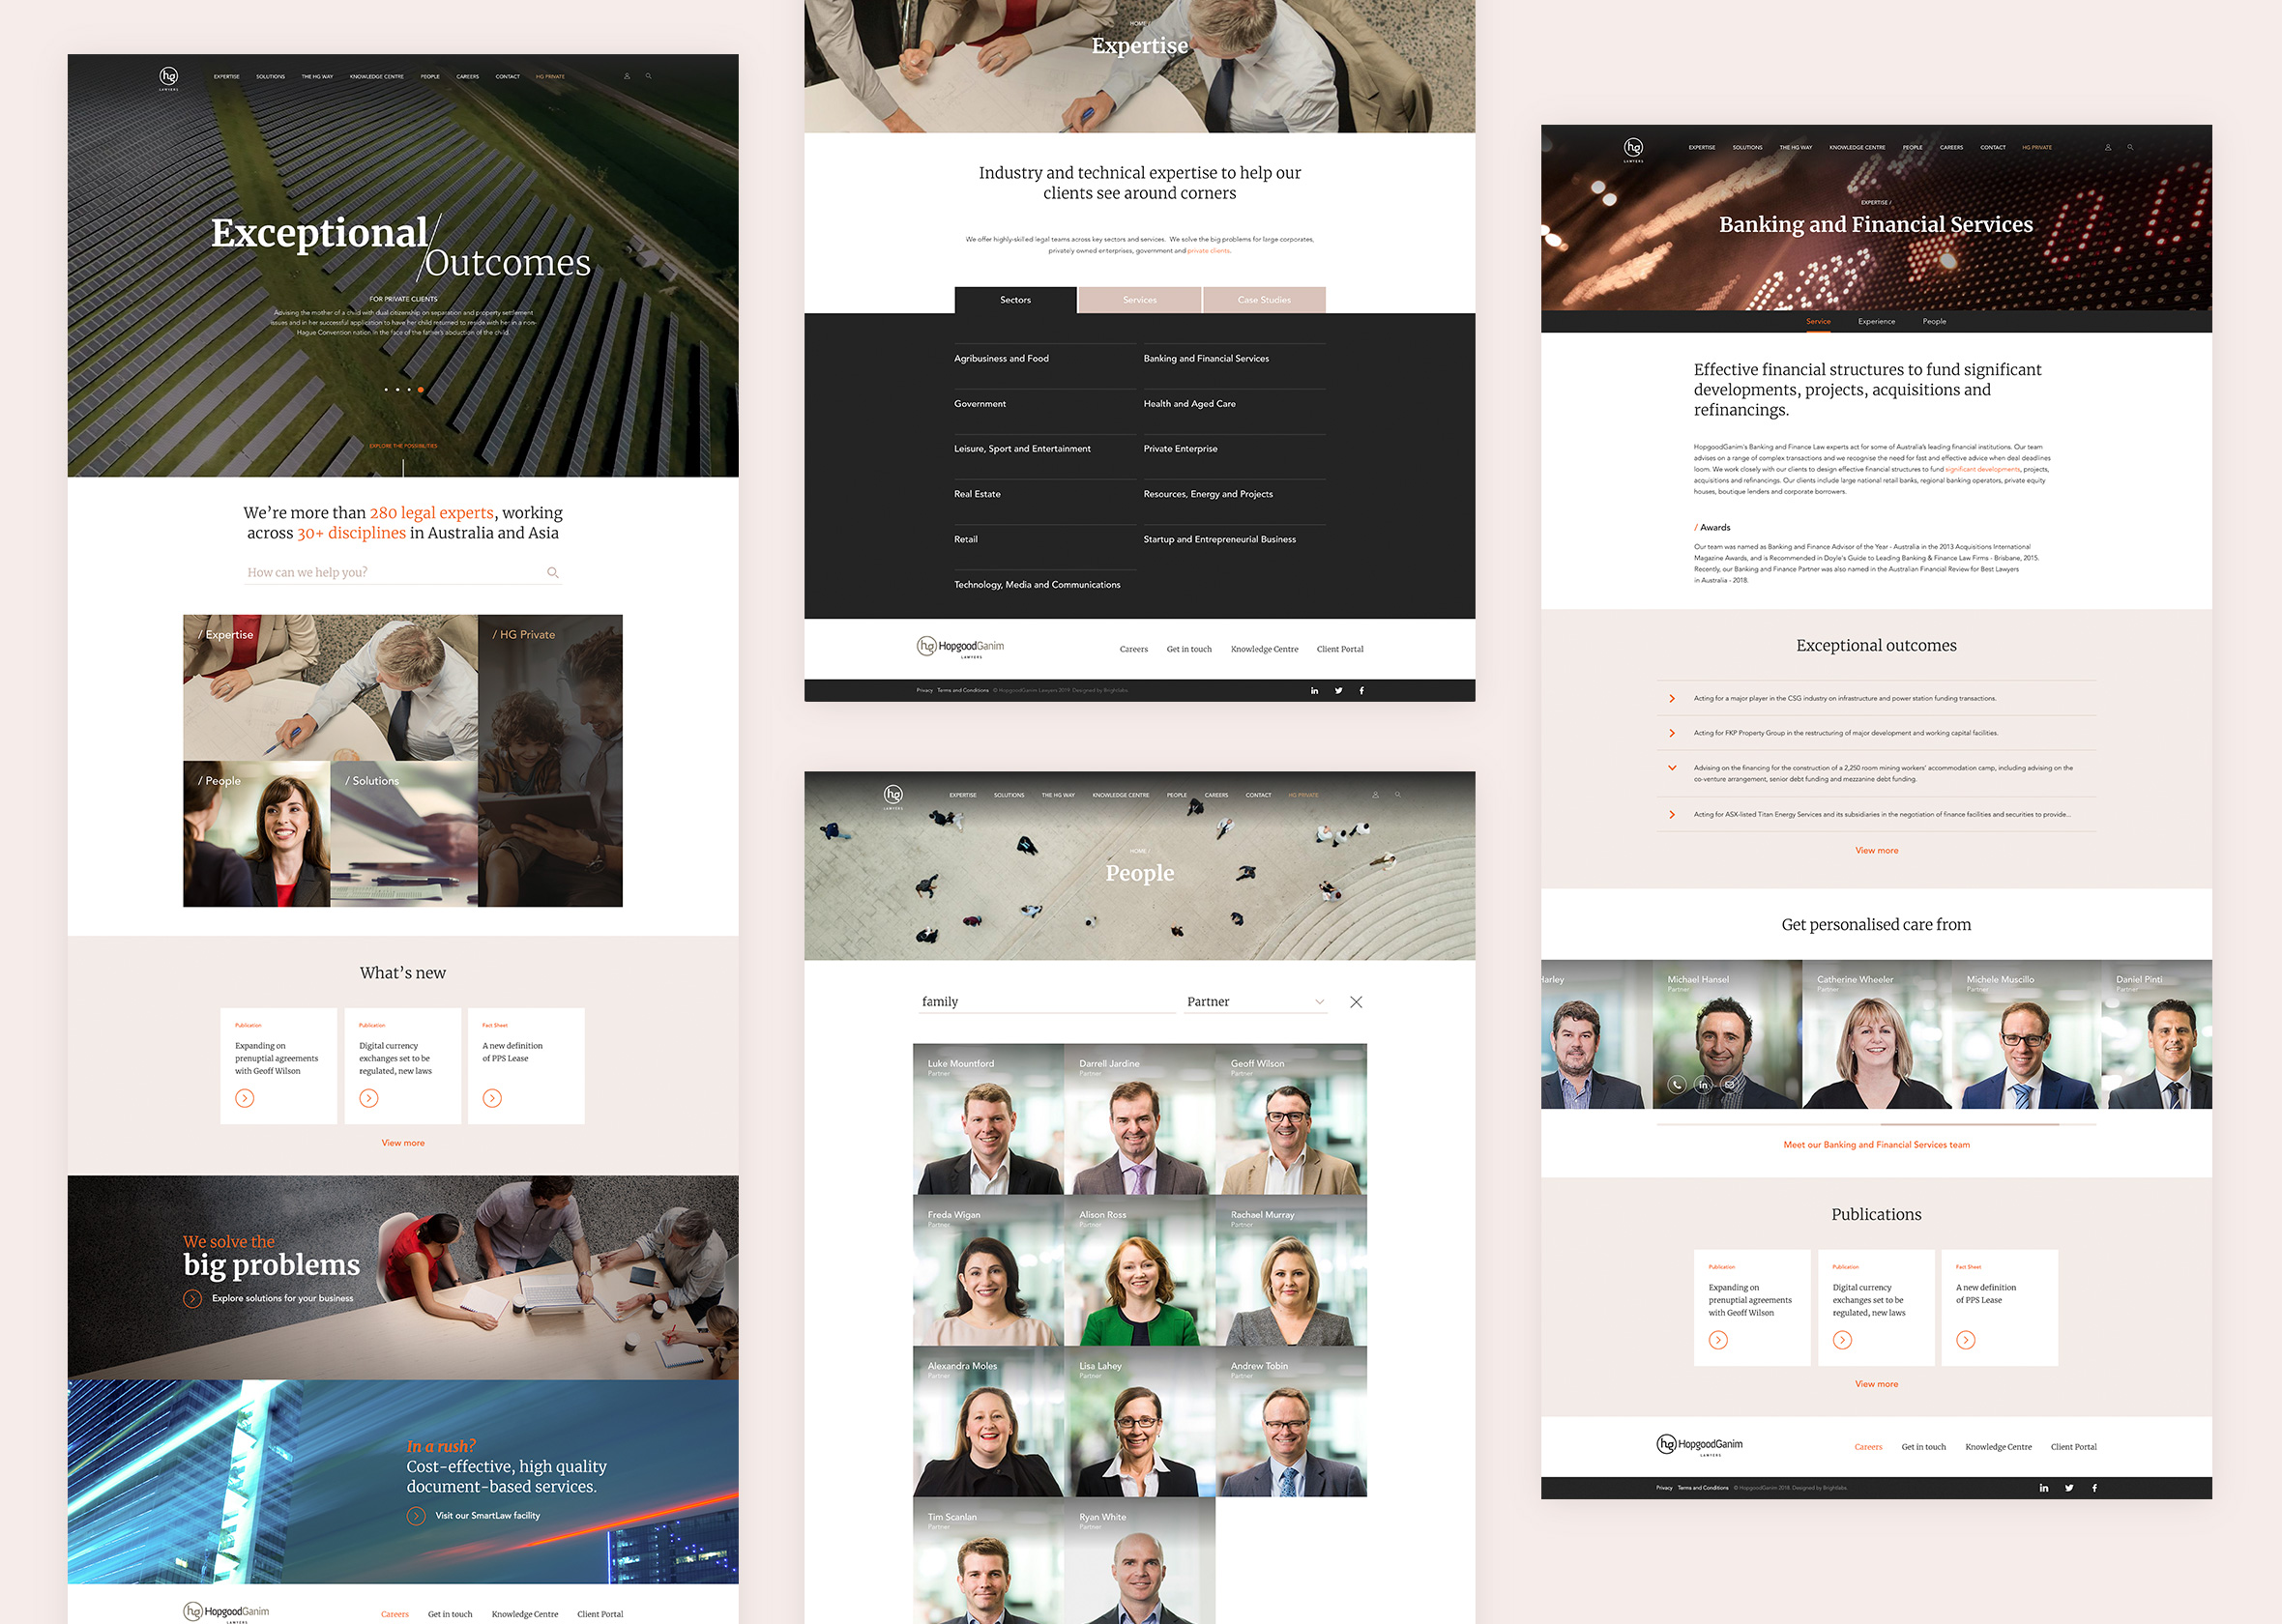 2 HG Webpages